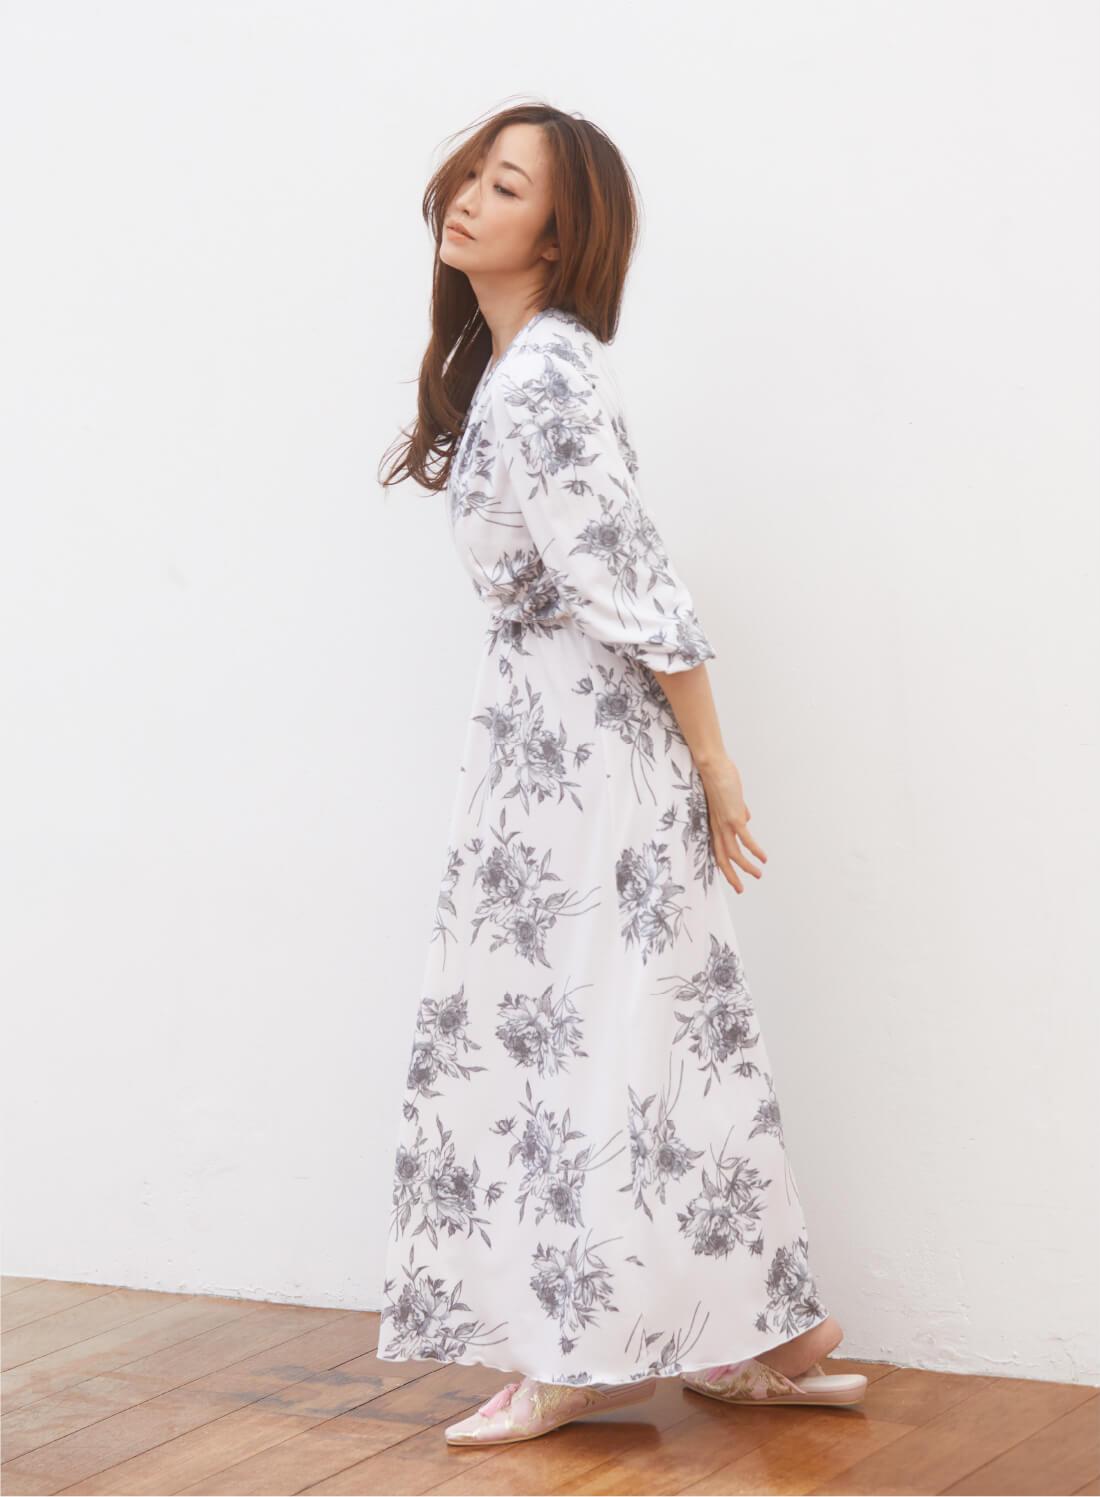 Dress 9,900yen , Room Shoes 4,950yen